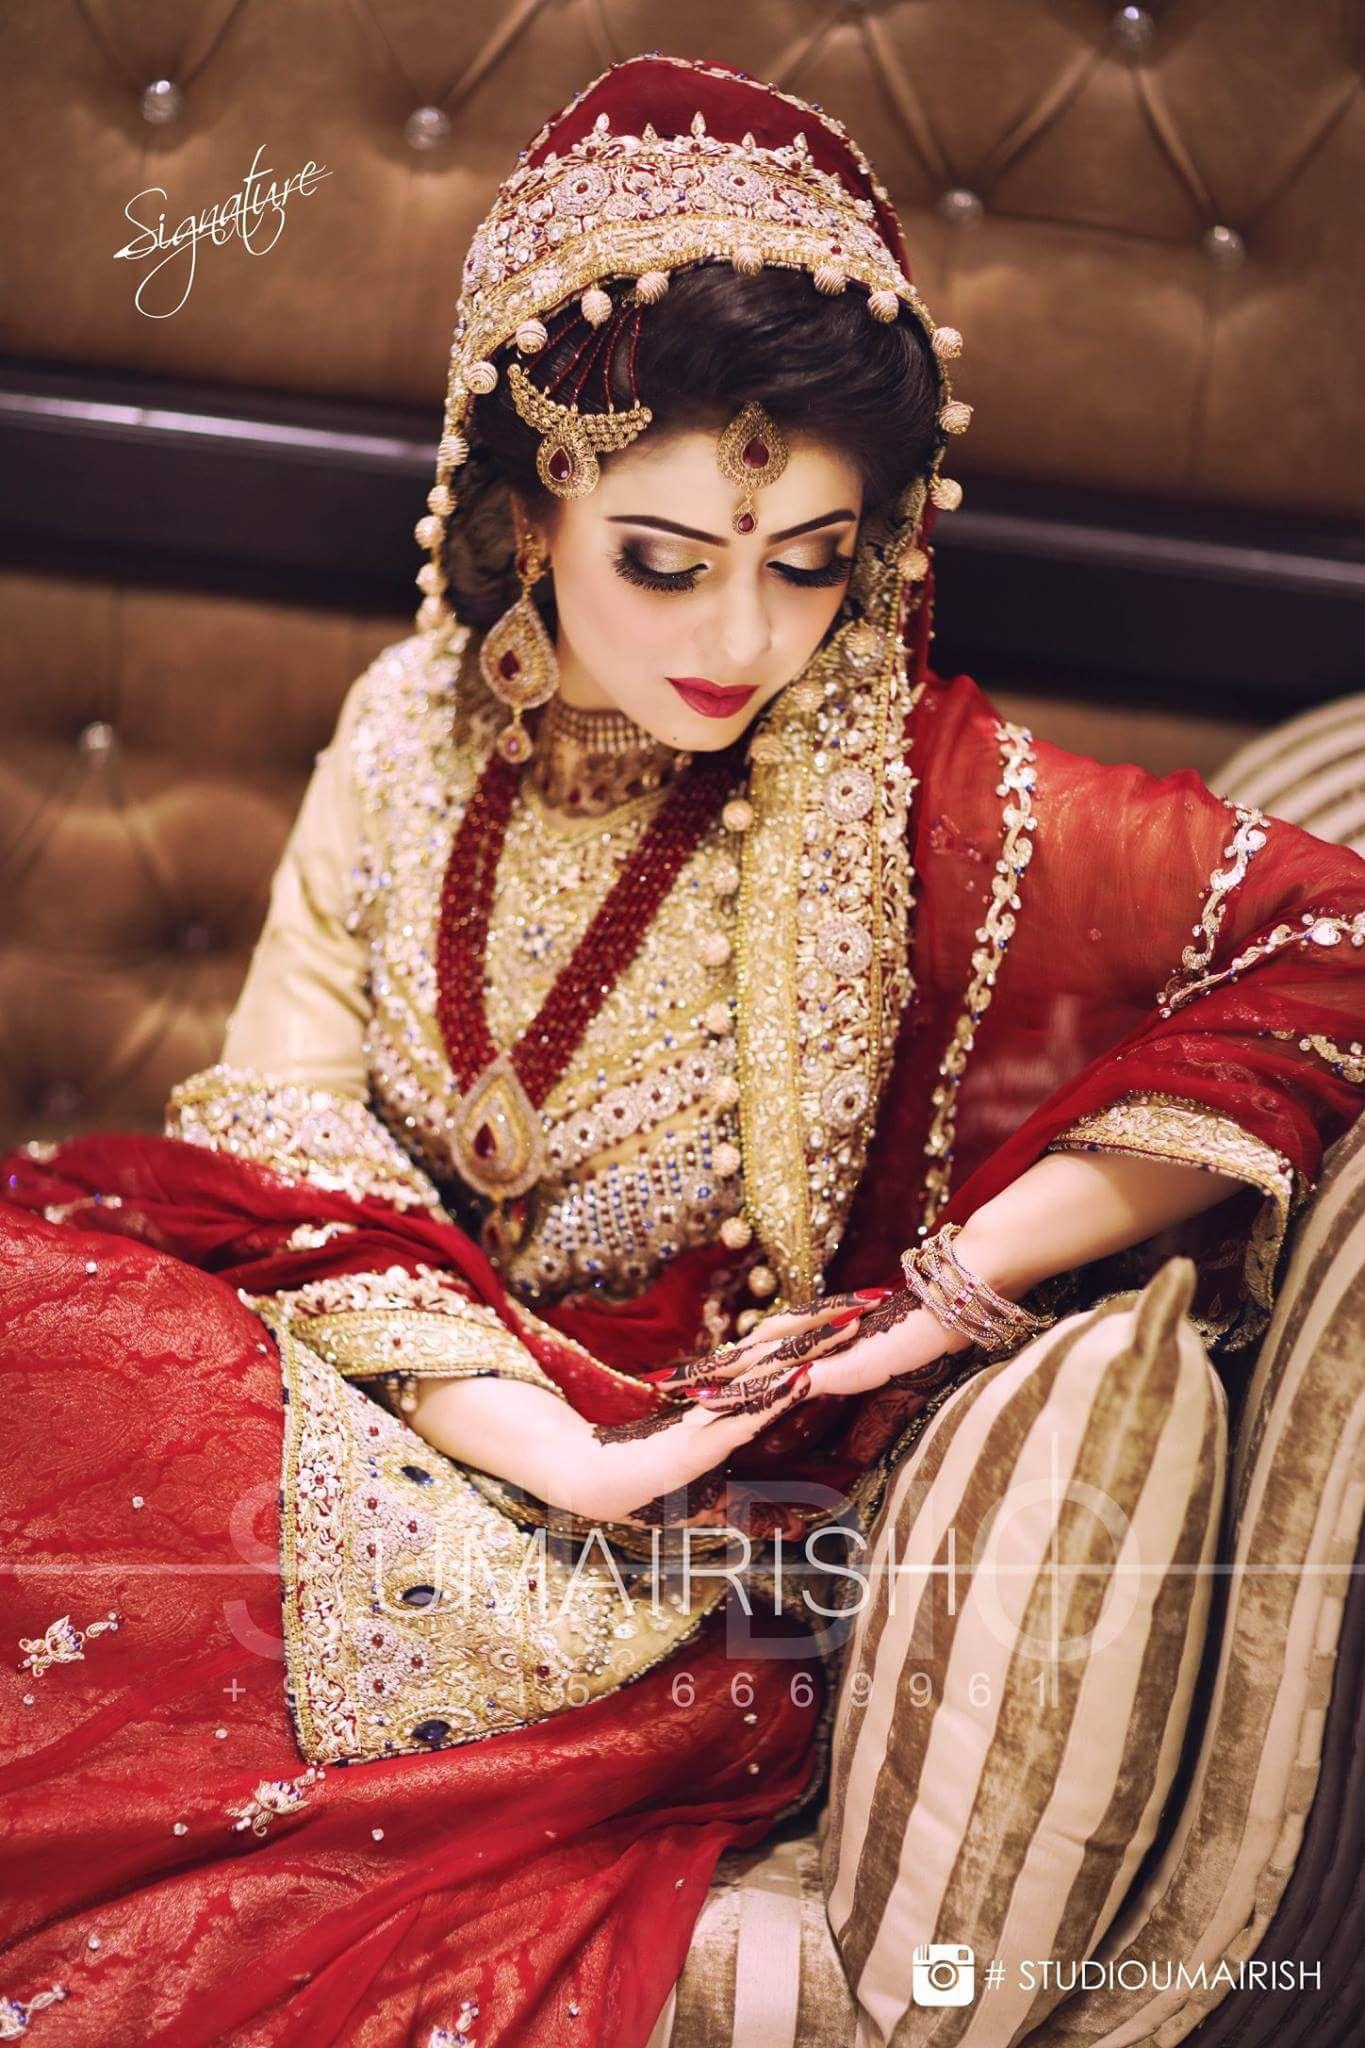 astonishing bride in barat look , photography by umairish